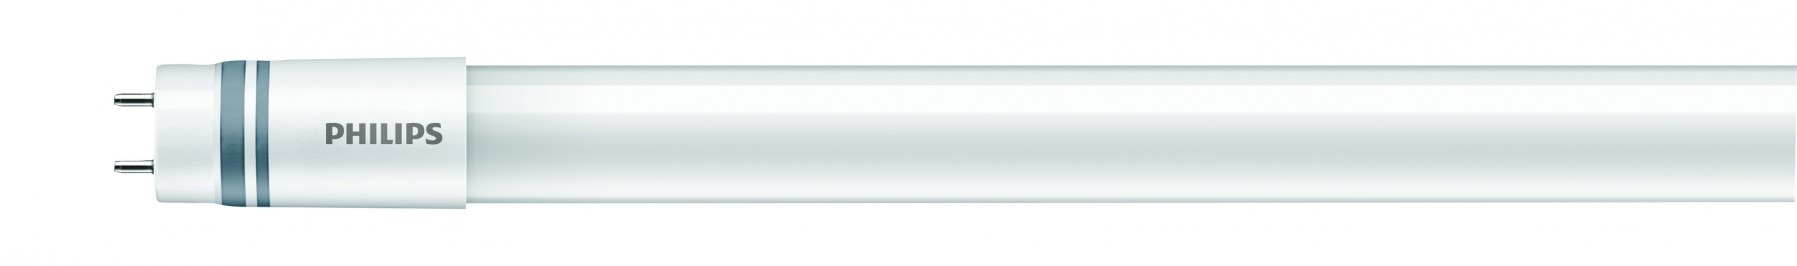 EVG Röhre Philips LED tube 120 cm